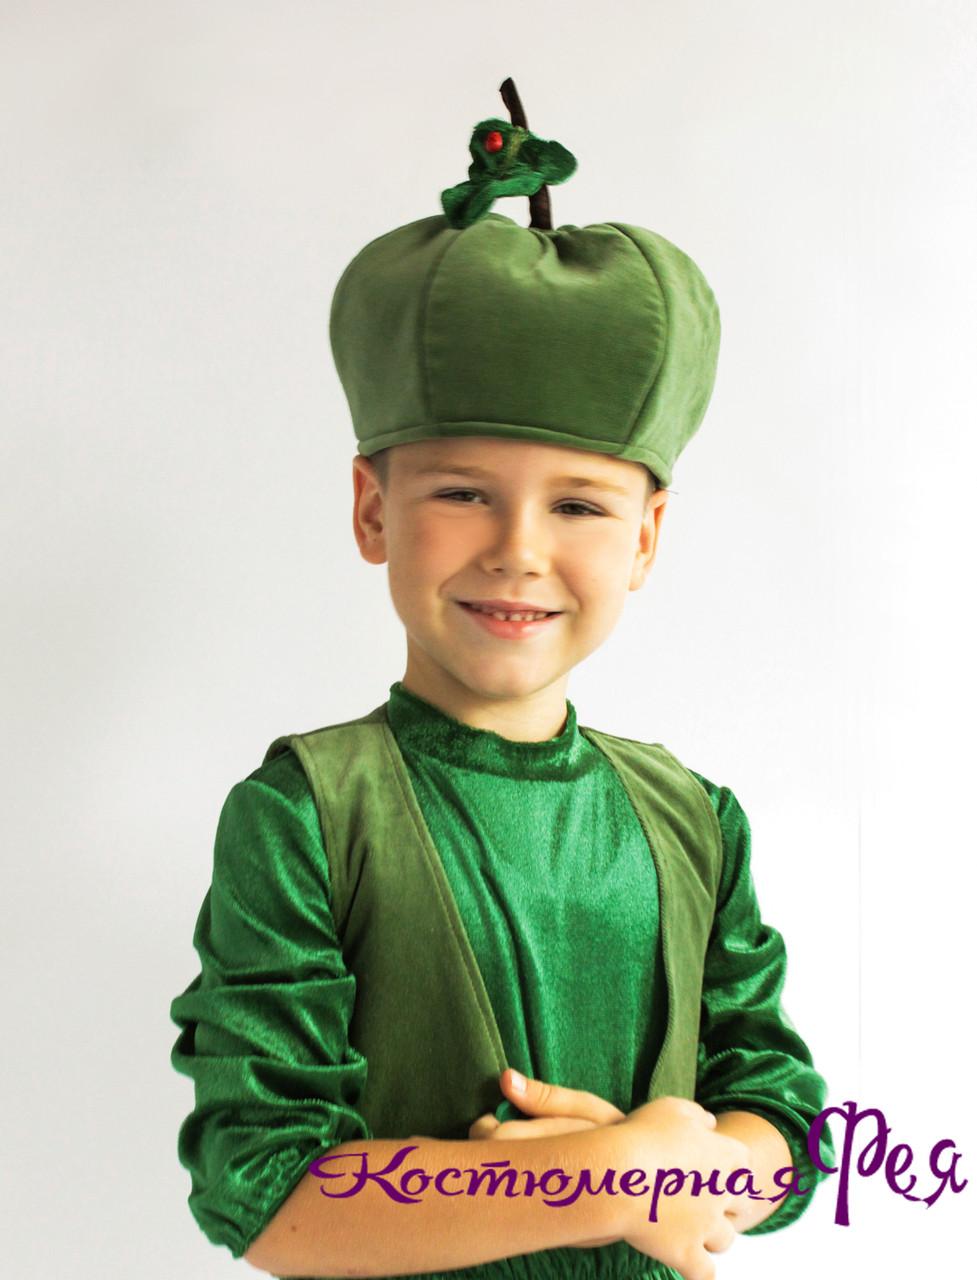 Яблоко, зеленое яблоко (код 89/1)